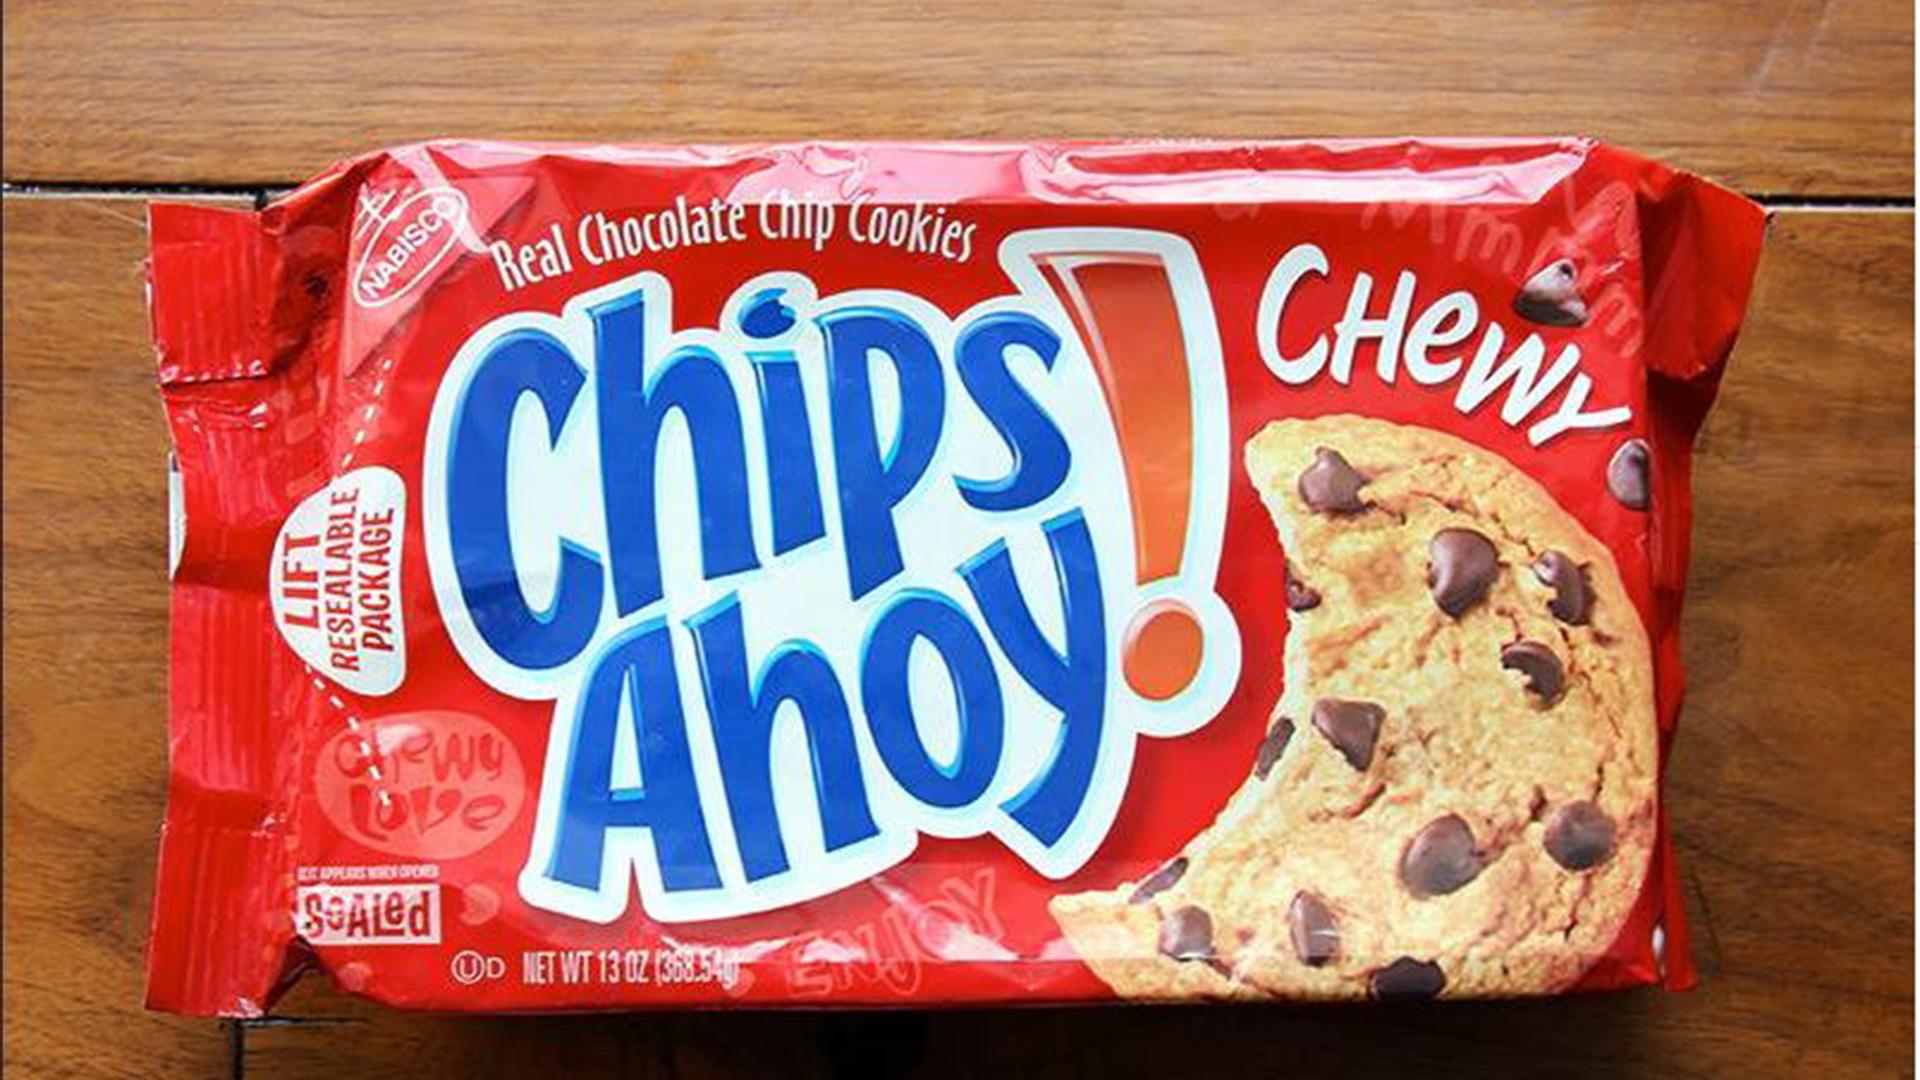 Chips Ahoy 1_1555429750432.jpg.jpg